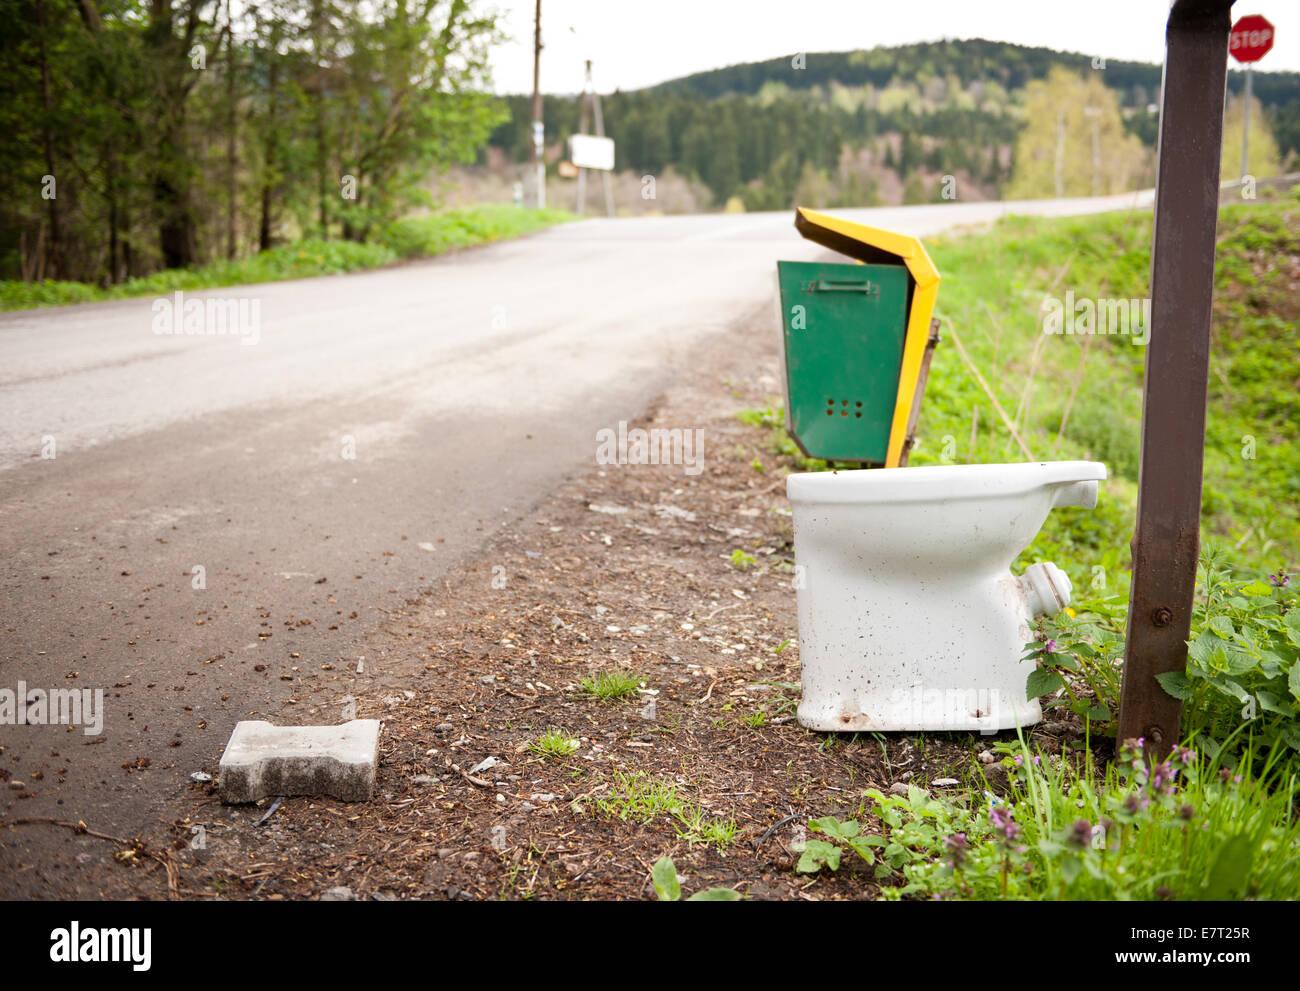 Old used toilette roadside garbage thrown away - Stock Image